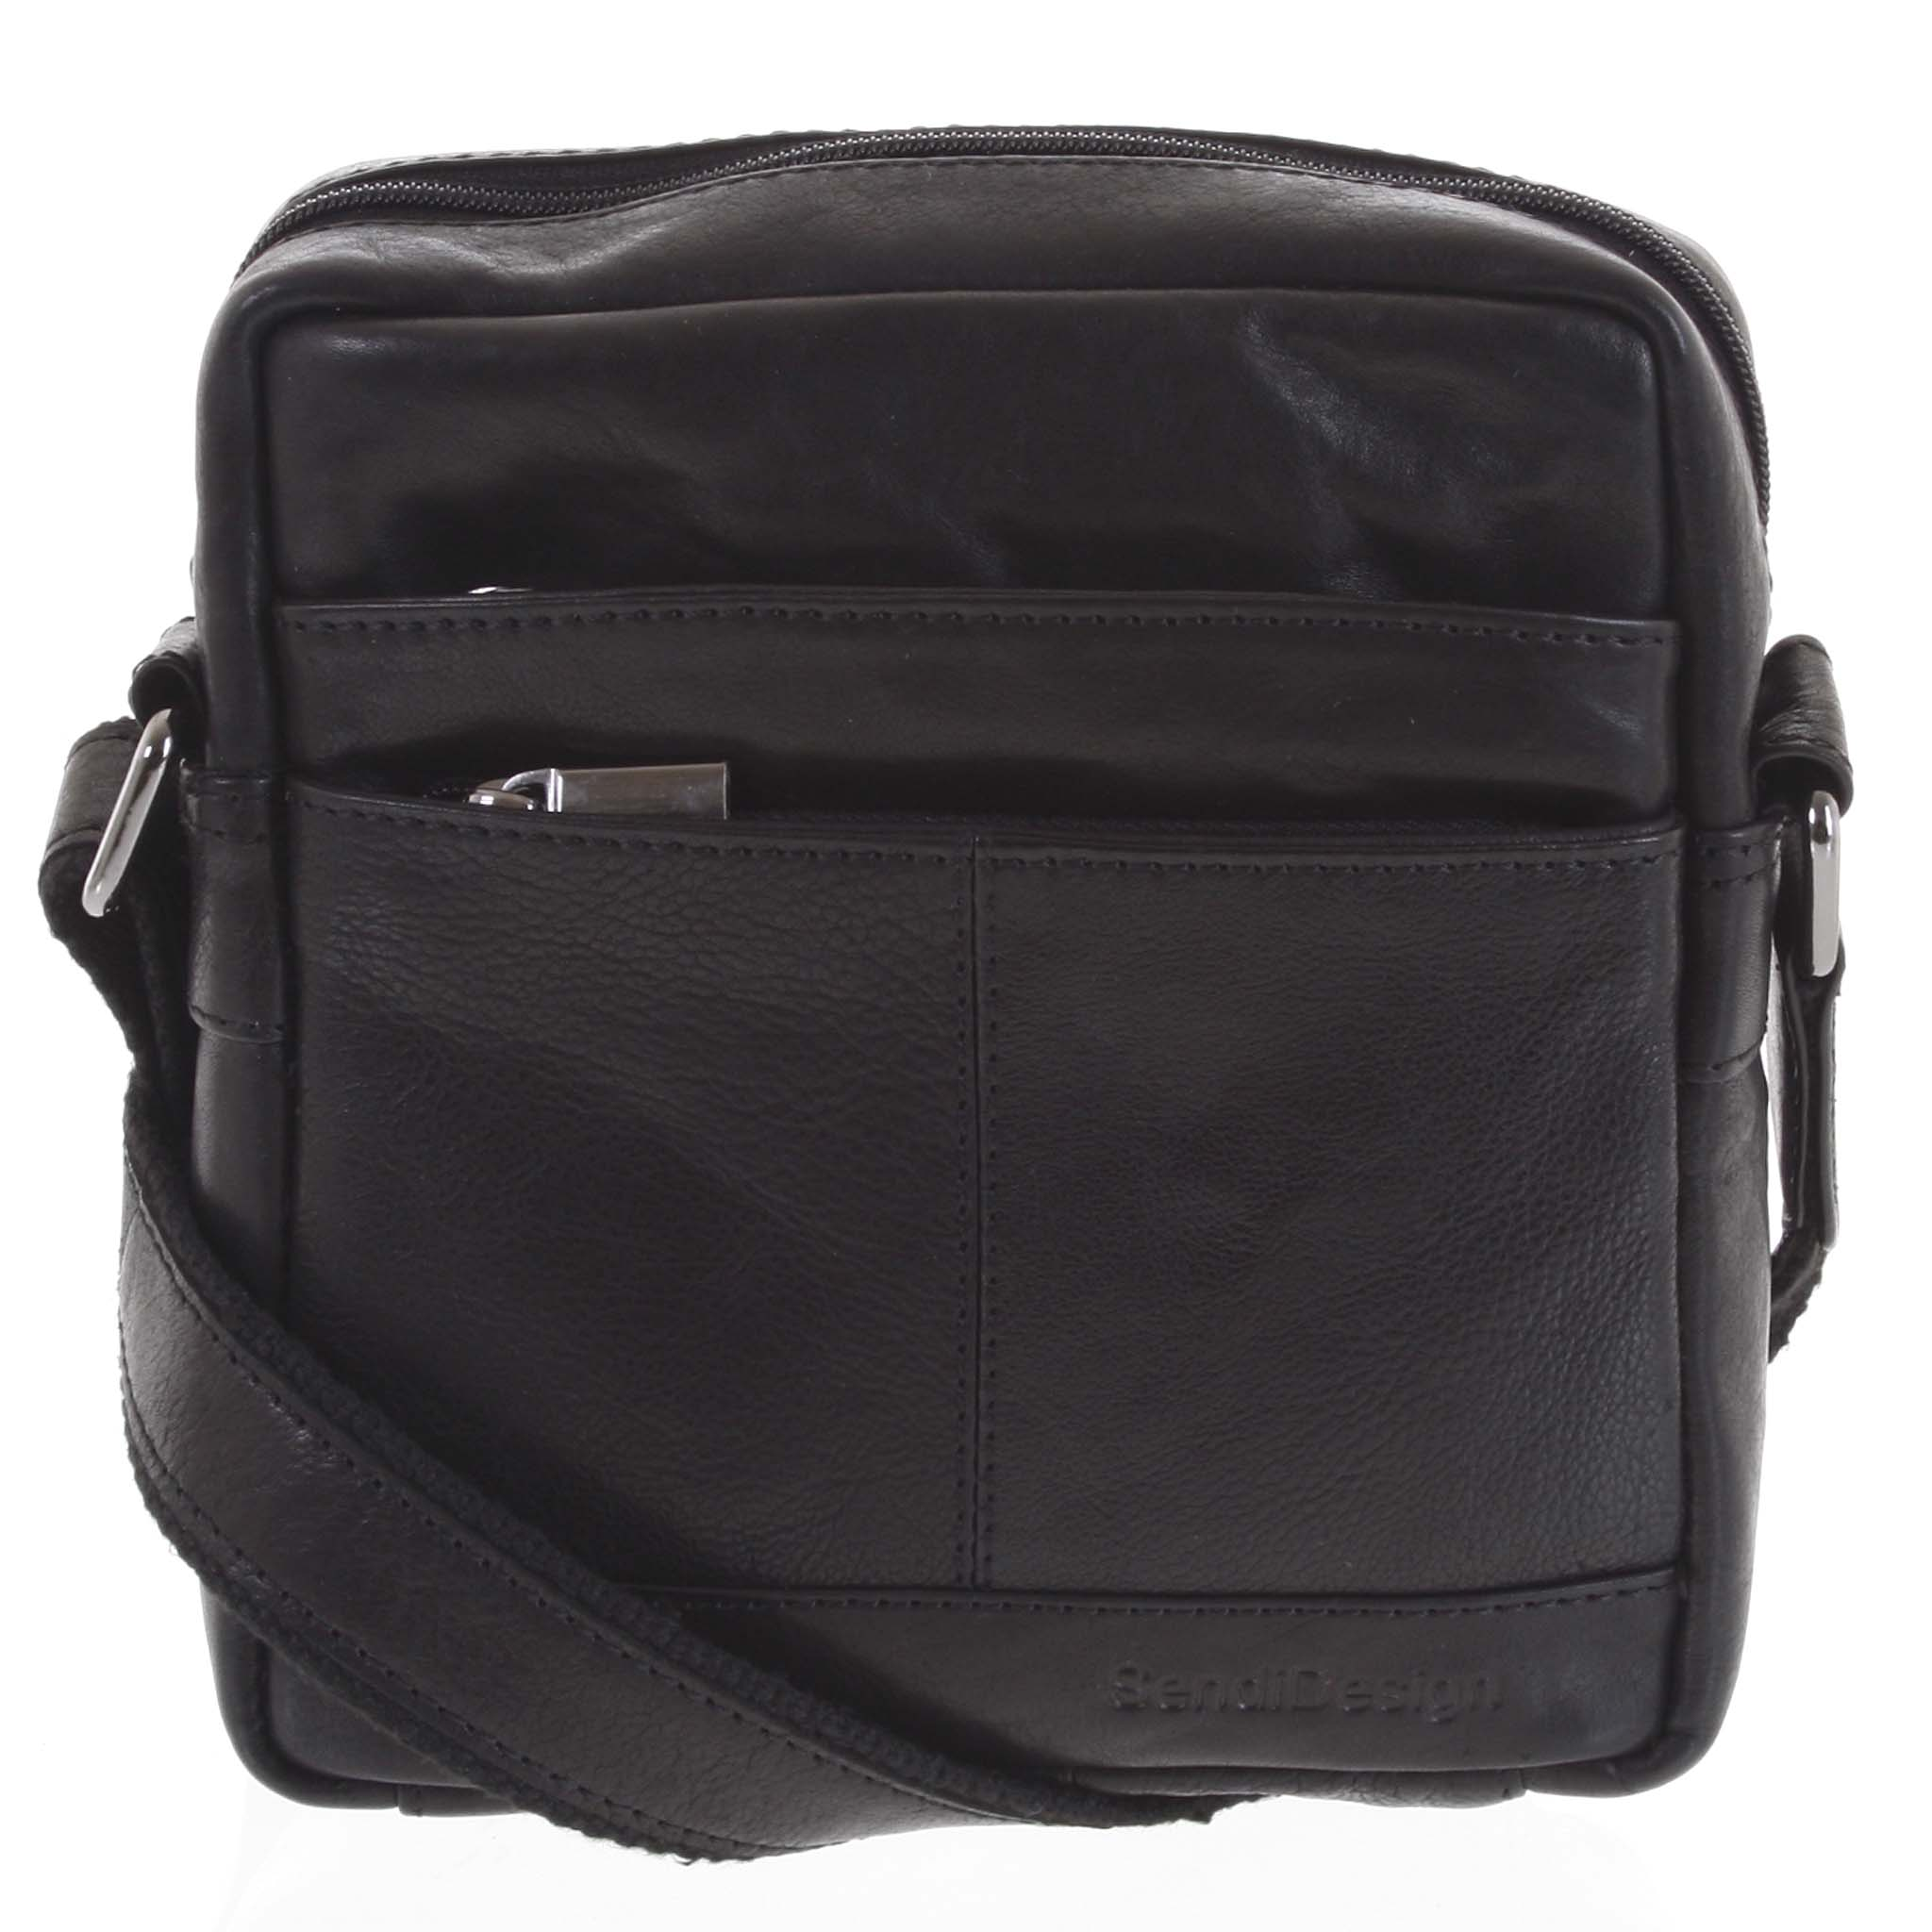 Pánská kožená taška černá - SendiDesign Shaper